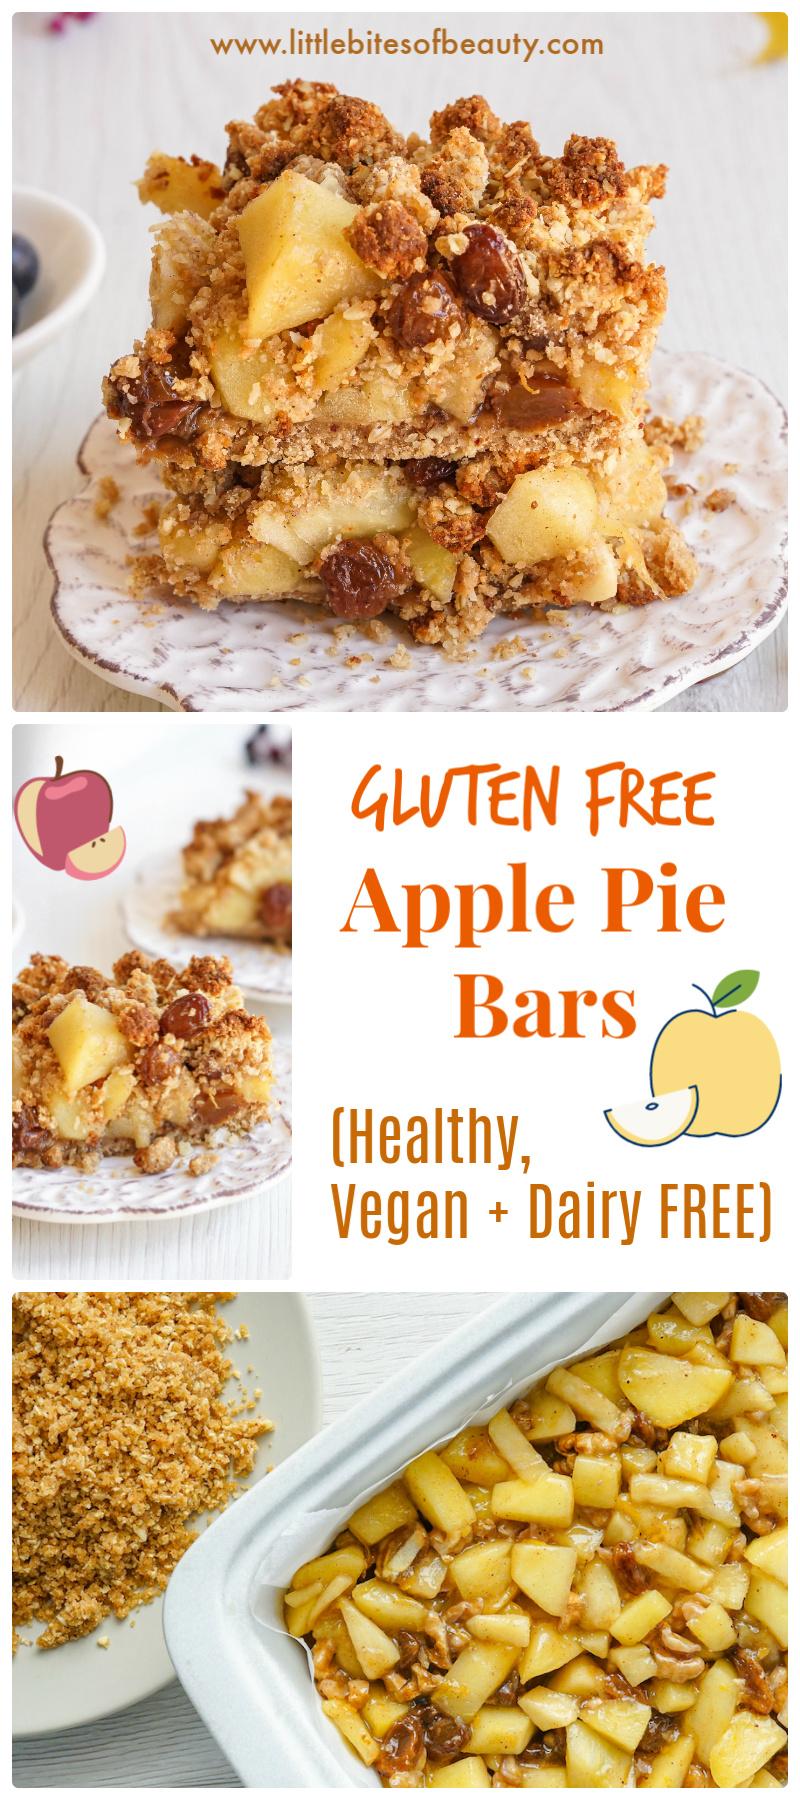 Gluten Free Apple Pie Bars (Dairy Free & Vegan)